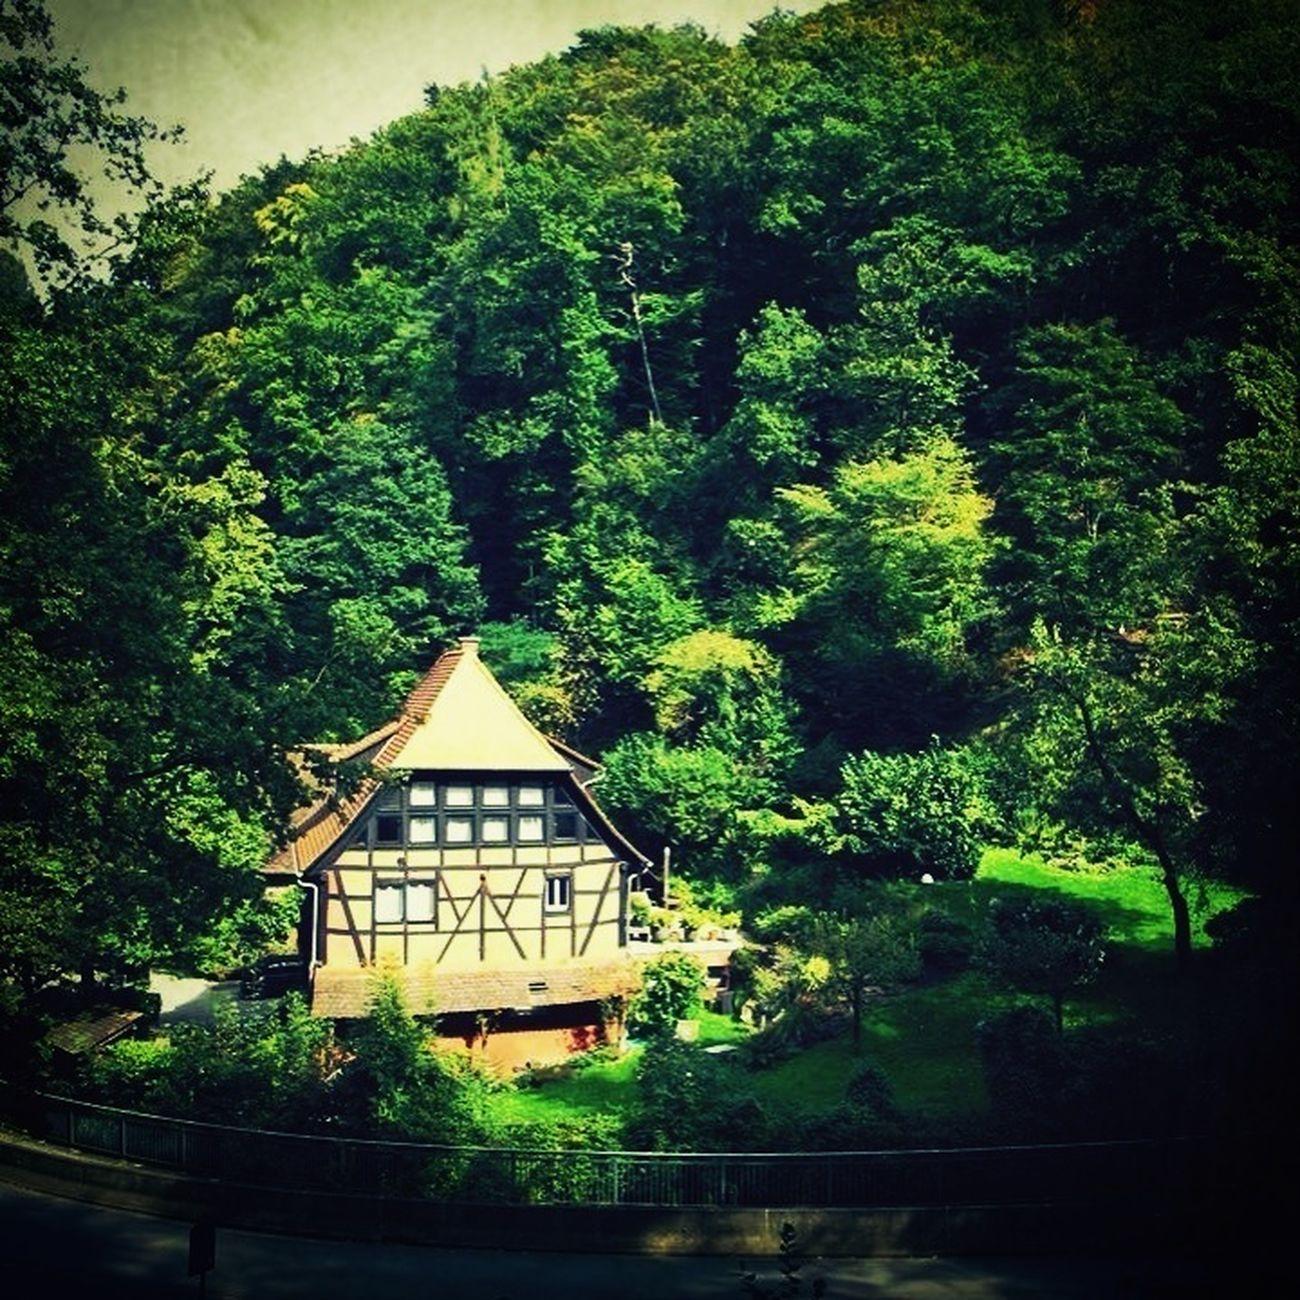 Forest Fachwerk Hexenhäuschen Houses